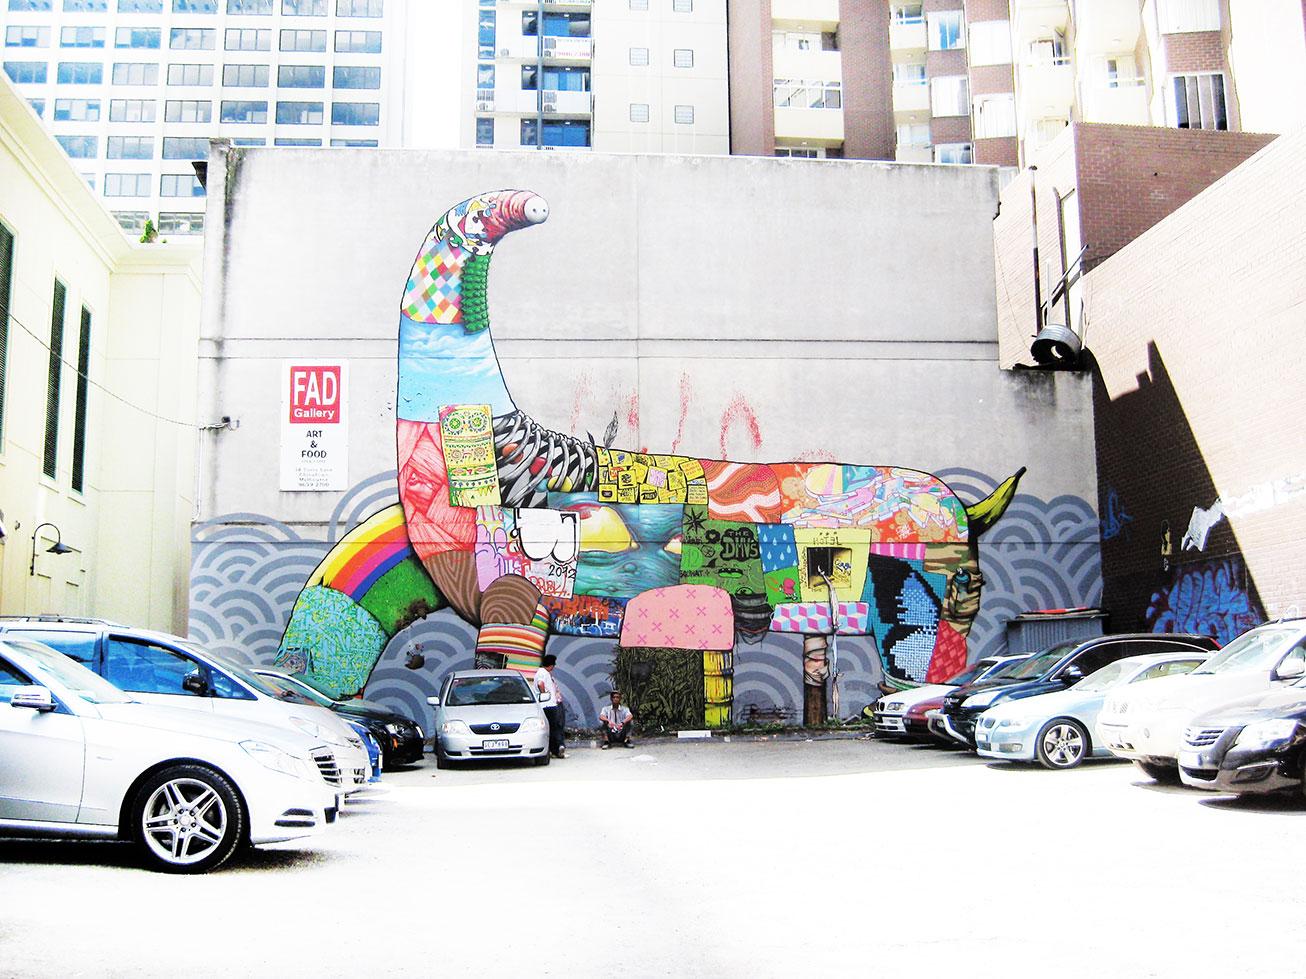 March 2012 - Chinatown, Melbourne